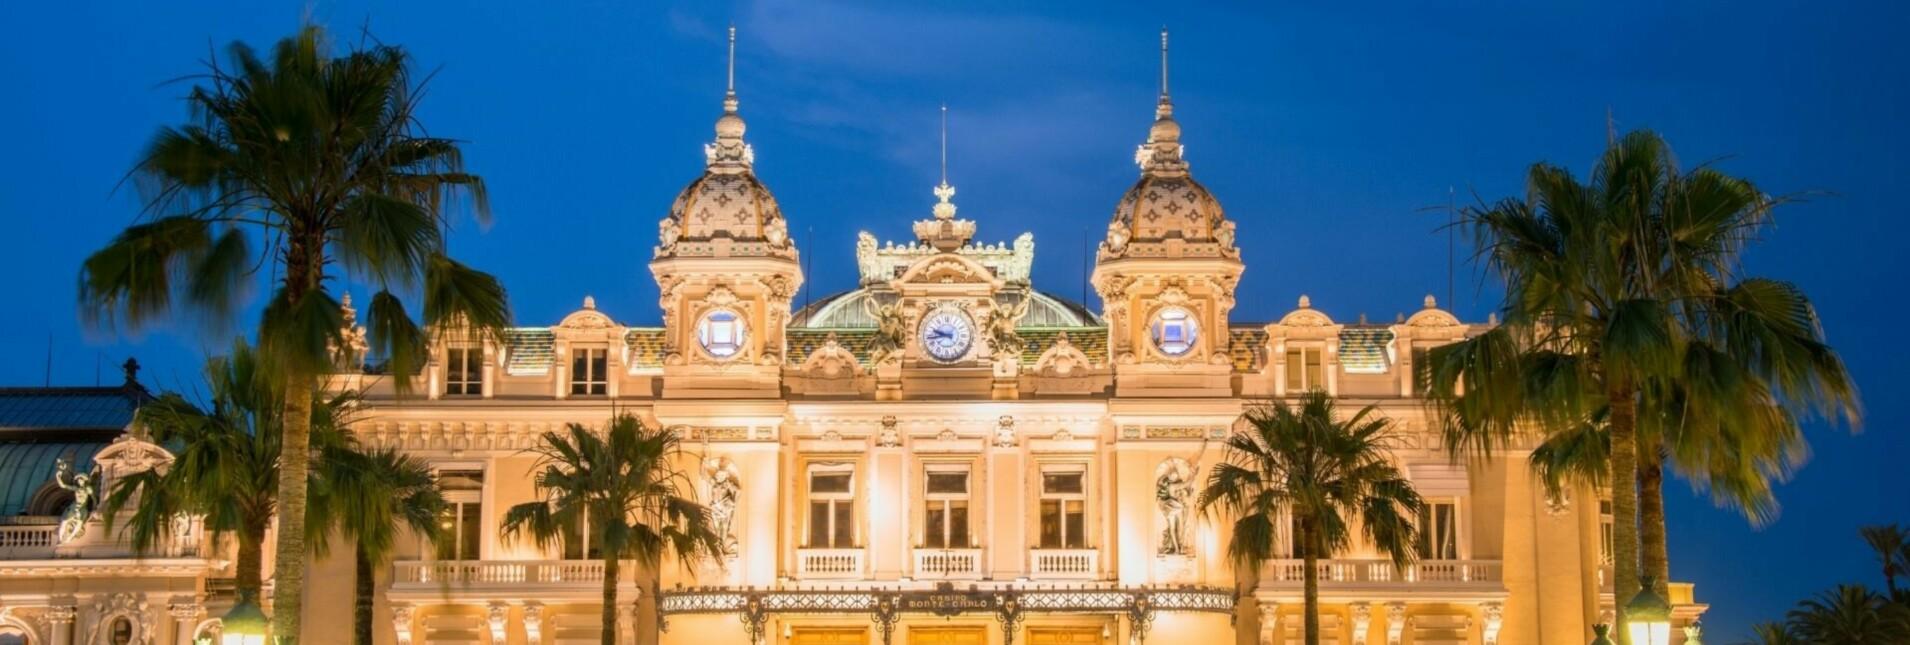 Formel 1 Grand Prix Monaco